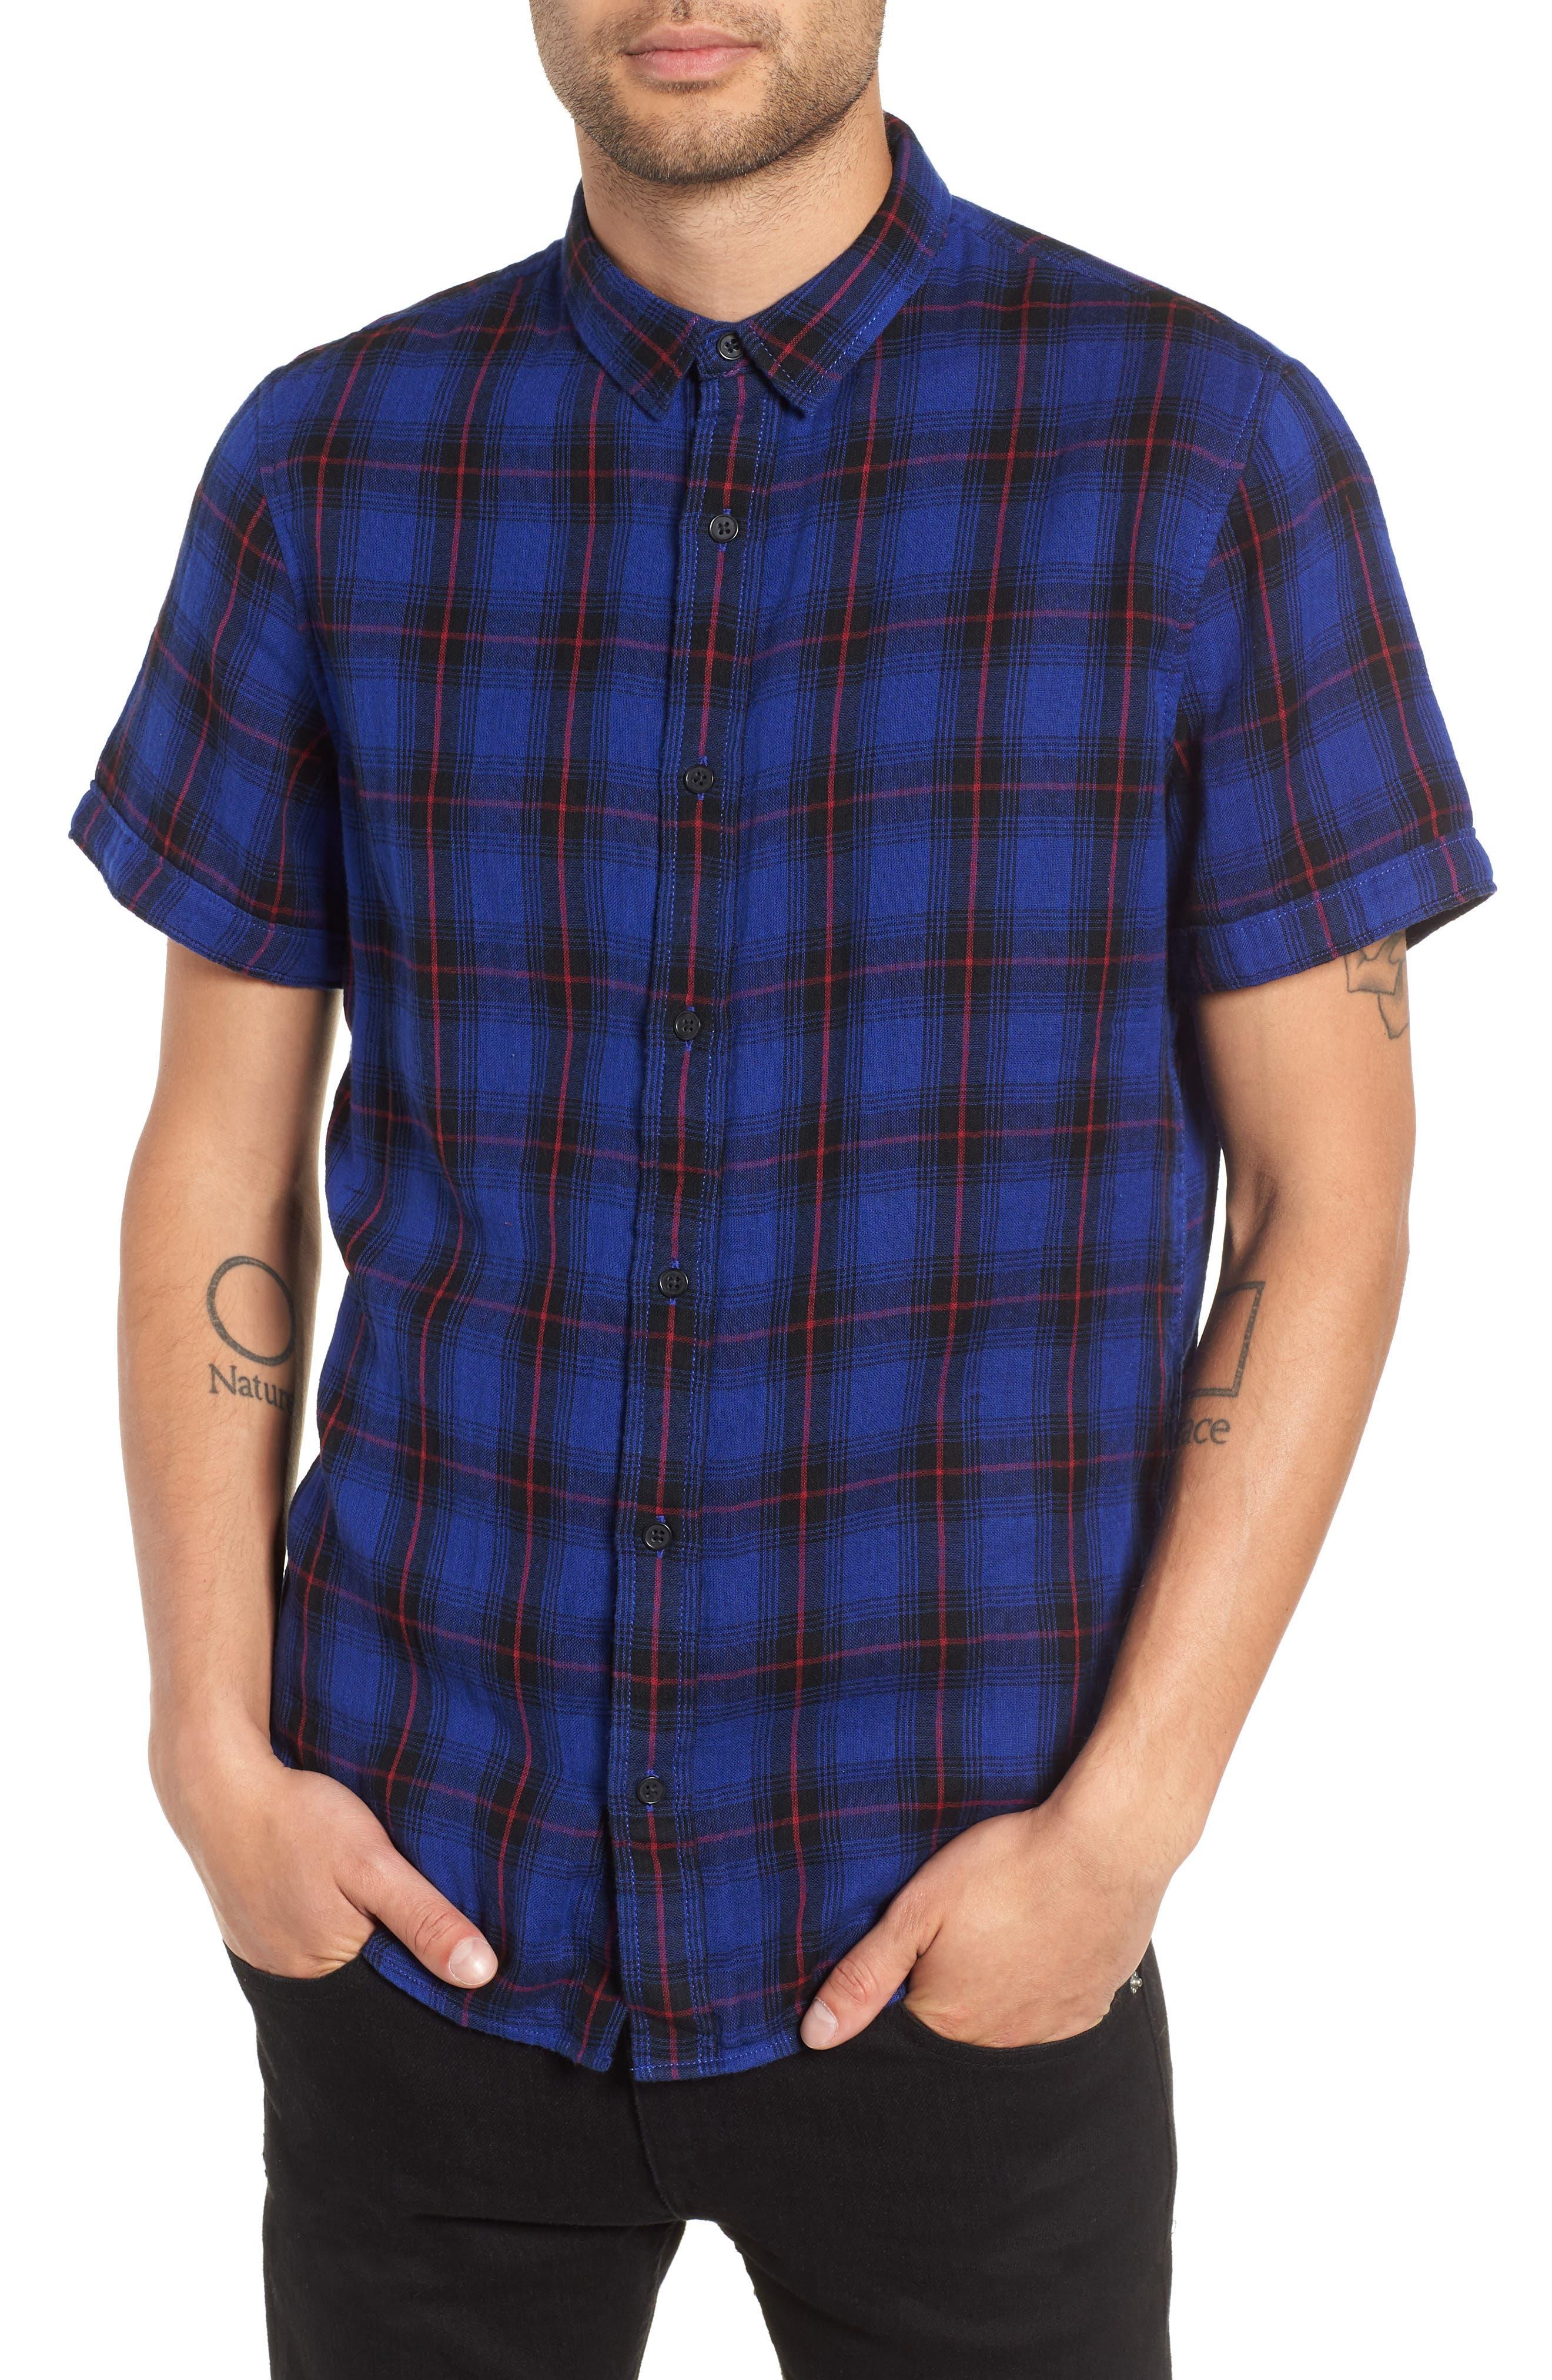 Plaid Woven Shirt,                             Main thumbnail 1, color,                             BLUE BLACK LUCA PLAID